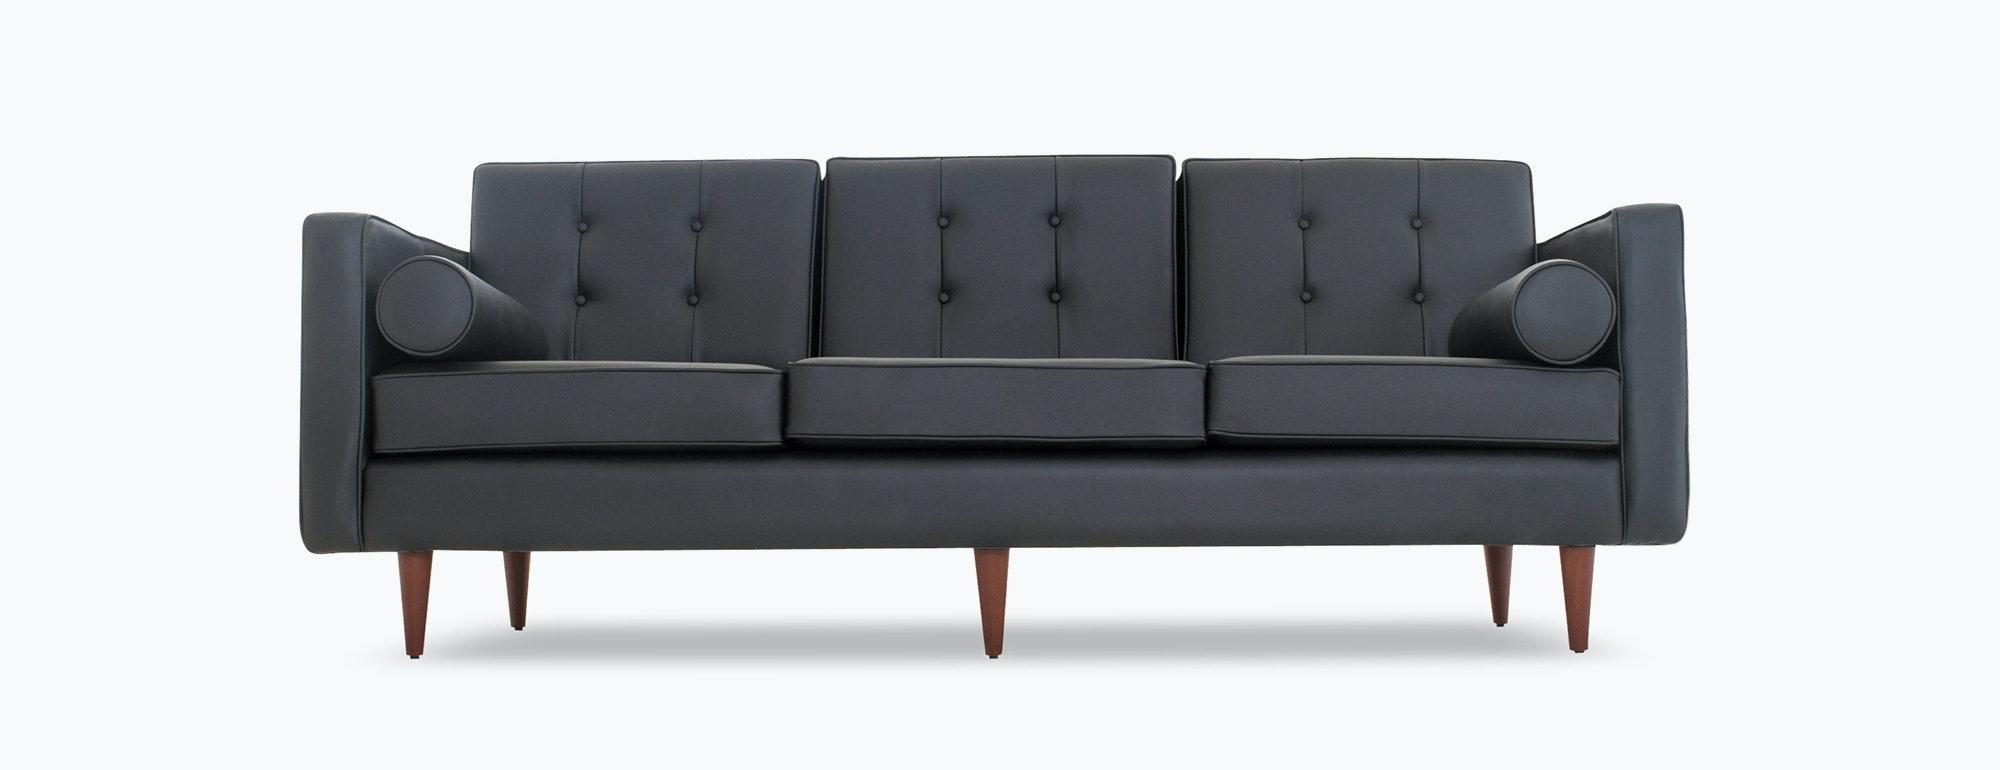 havertys furniture leather sofas queen sleeper sofa modern braxton review aecagra org thesofa